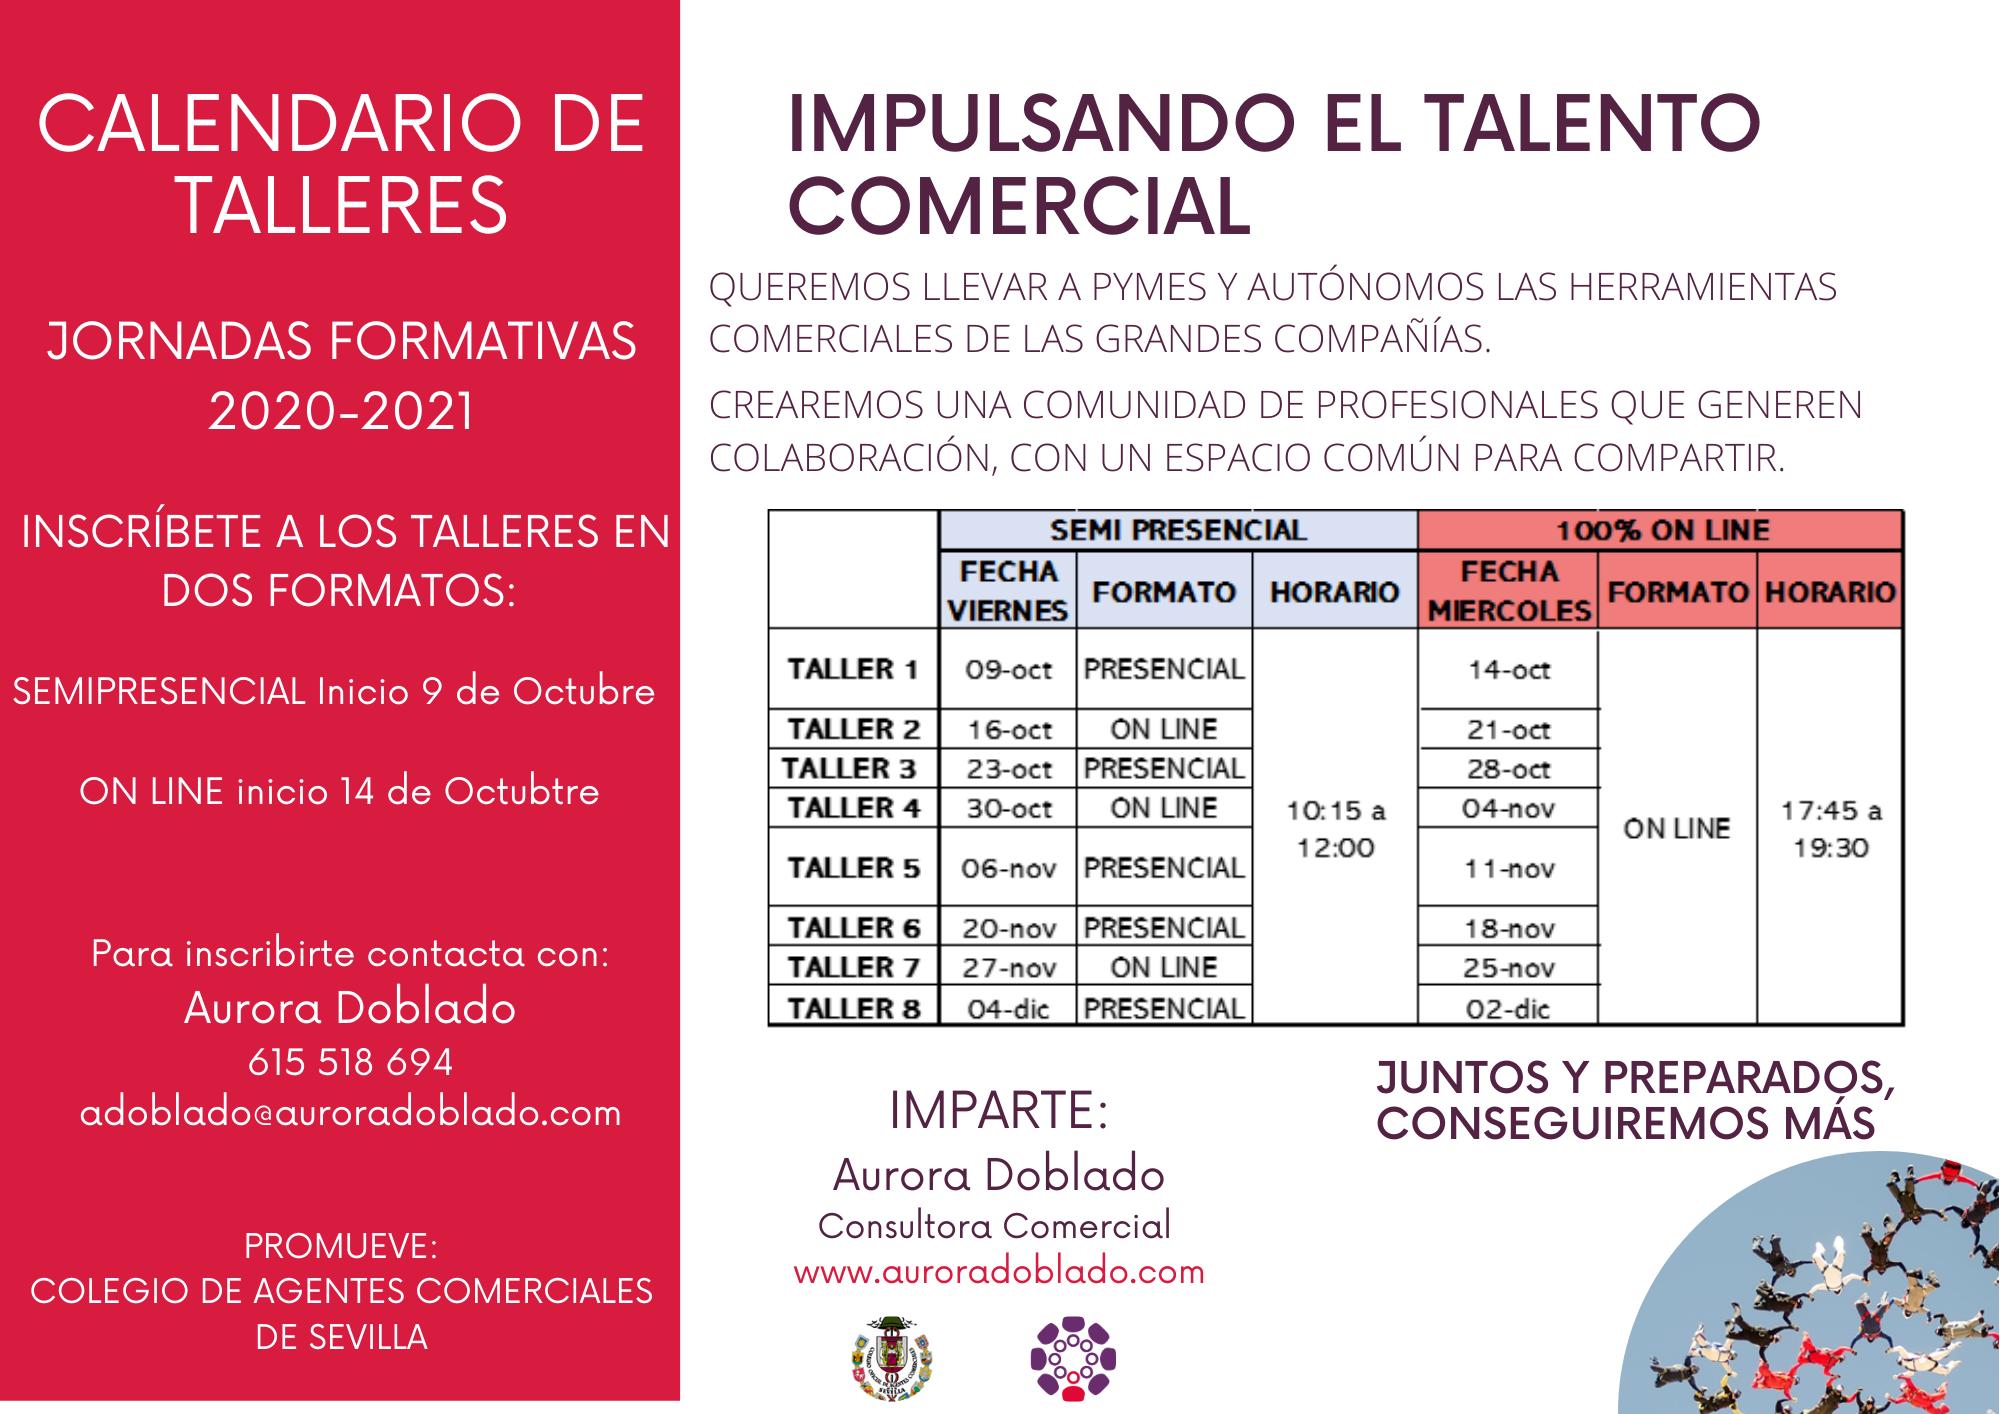 https://www.auroradoblado.com/wp-content/uploads/2020/10/PUBLICACION-INICIO-DE-TALLERES-COAC.png